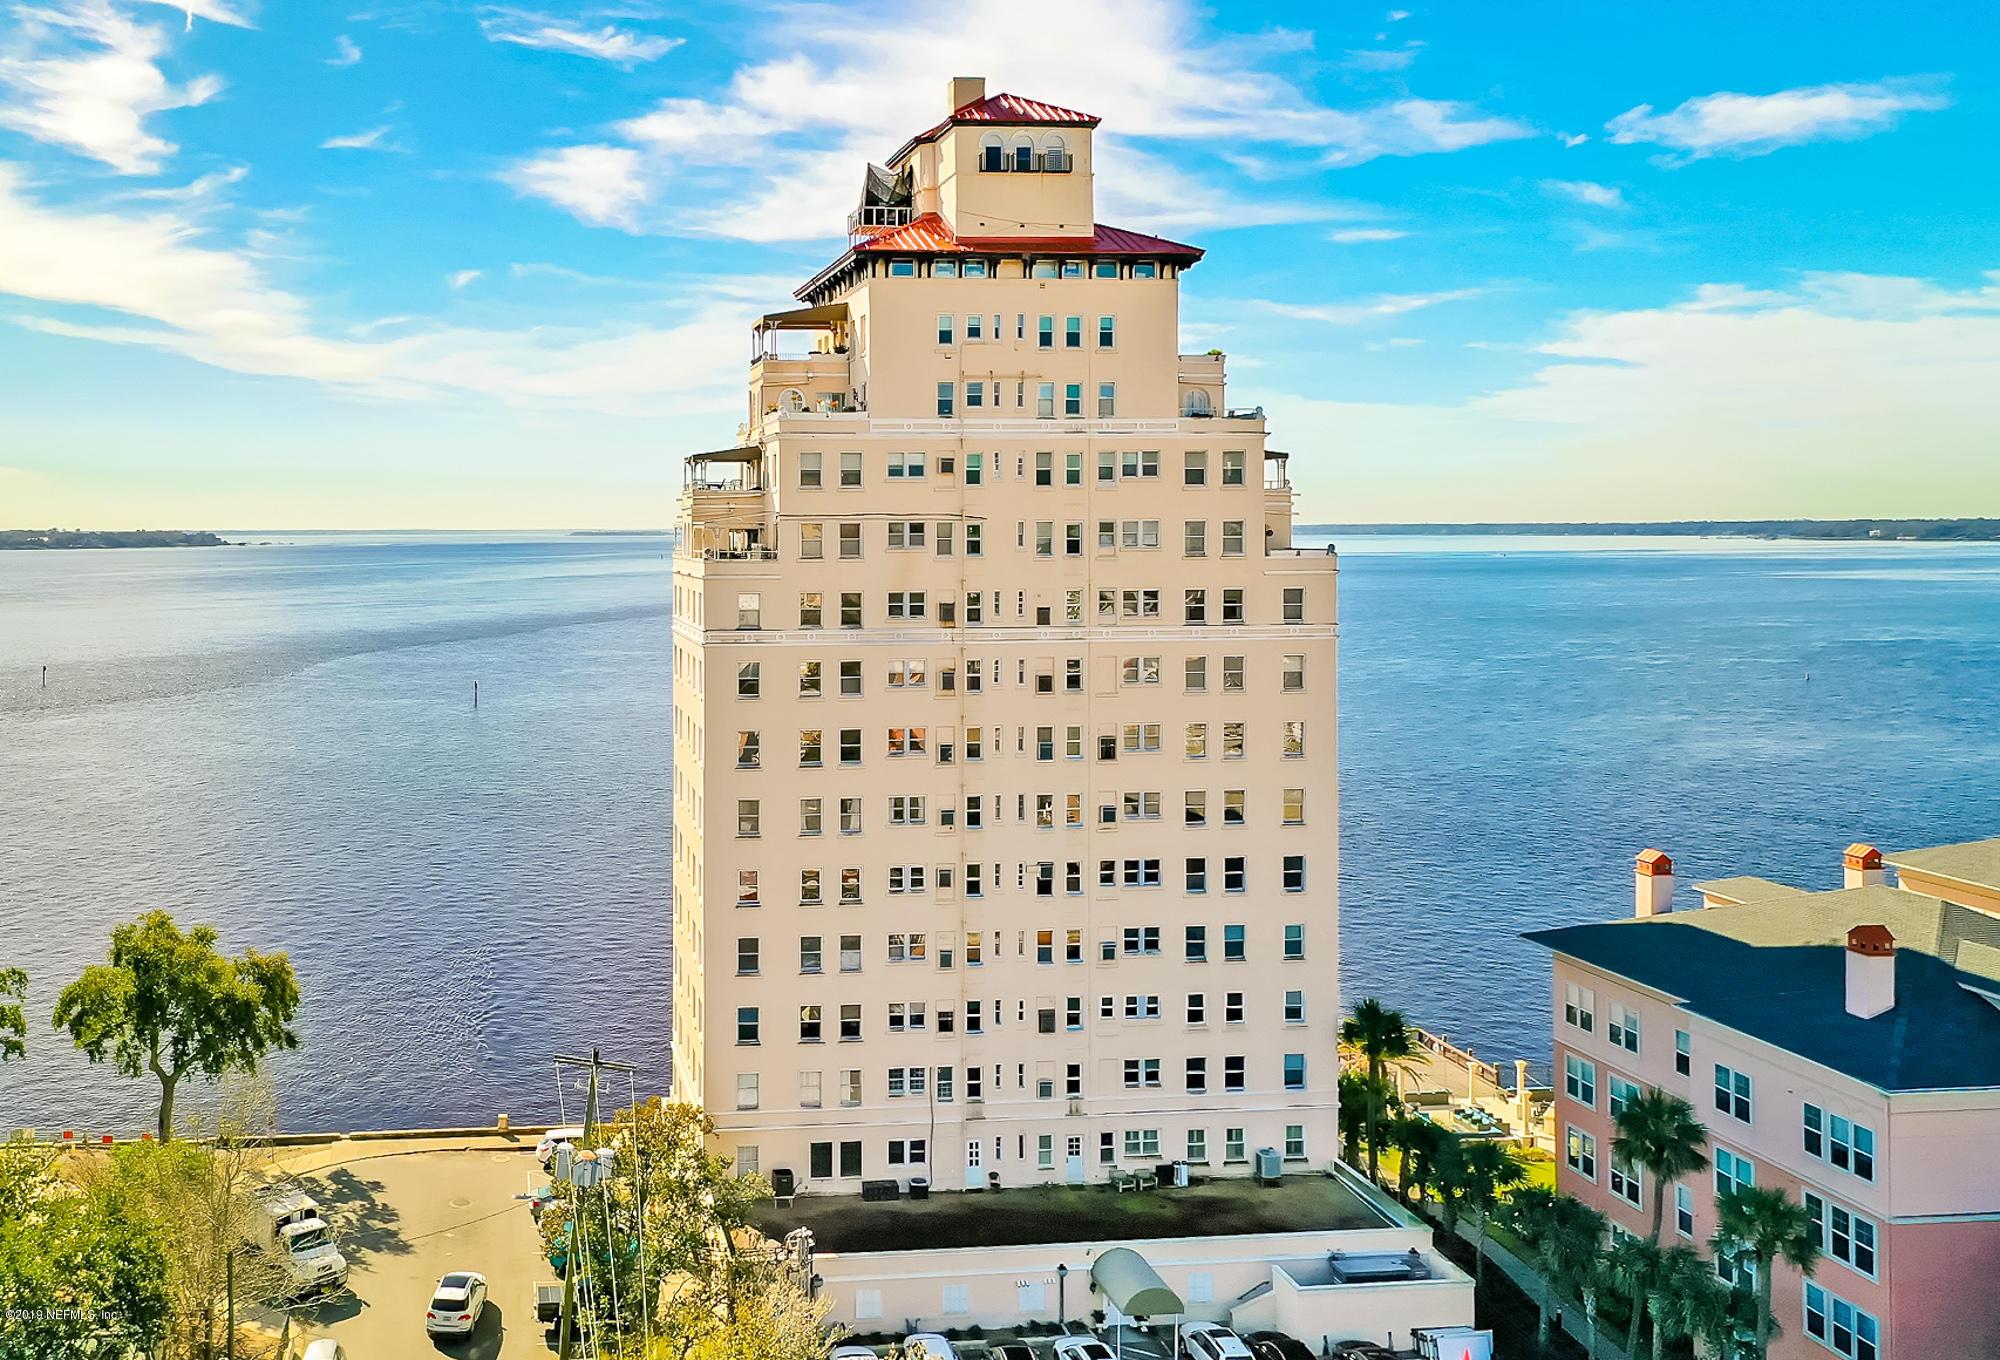 1846 MARGARET, JACKSONVILLE, FLORIDA 32204, 2 Bedrooms Bedrooms, ,1 BathroomBathrooms,Residential - condos/townhomes,For sale,MARGARET,979722